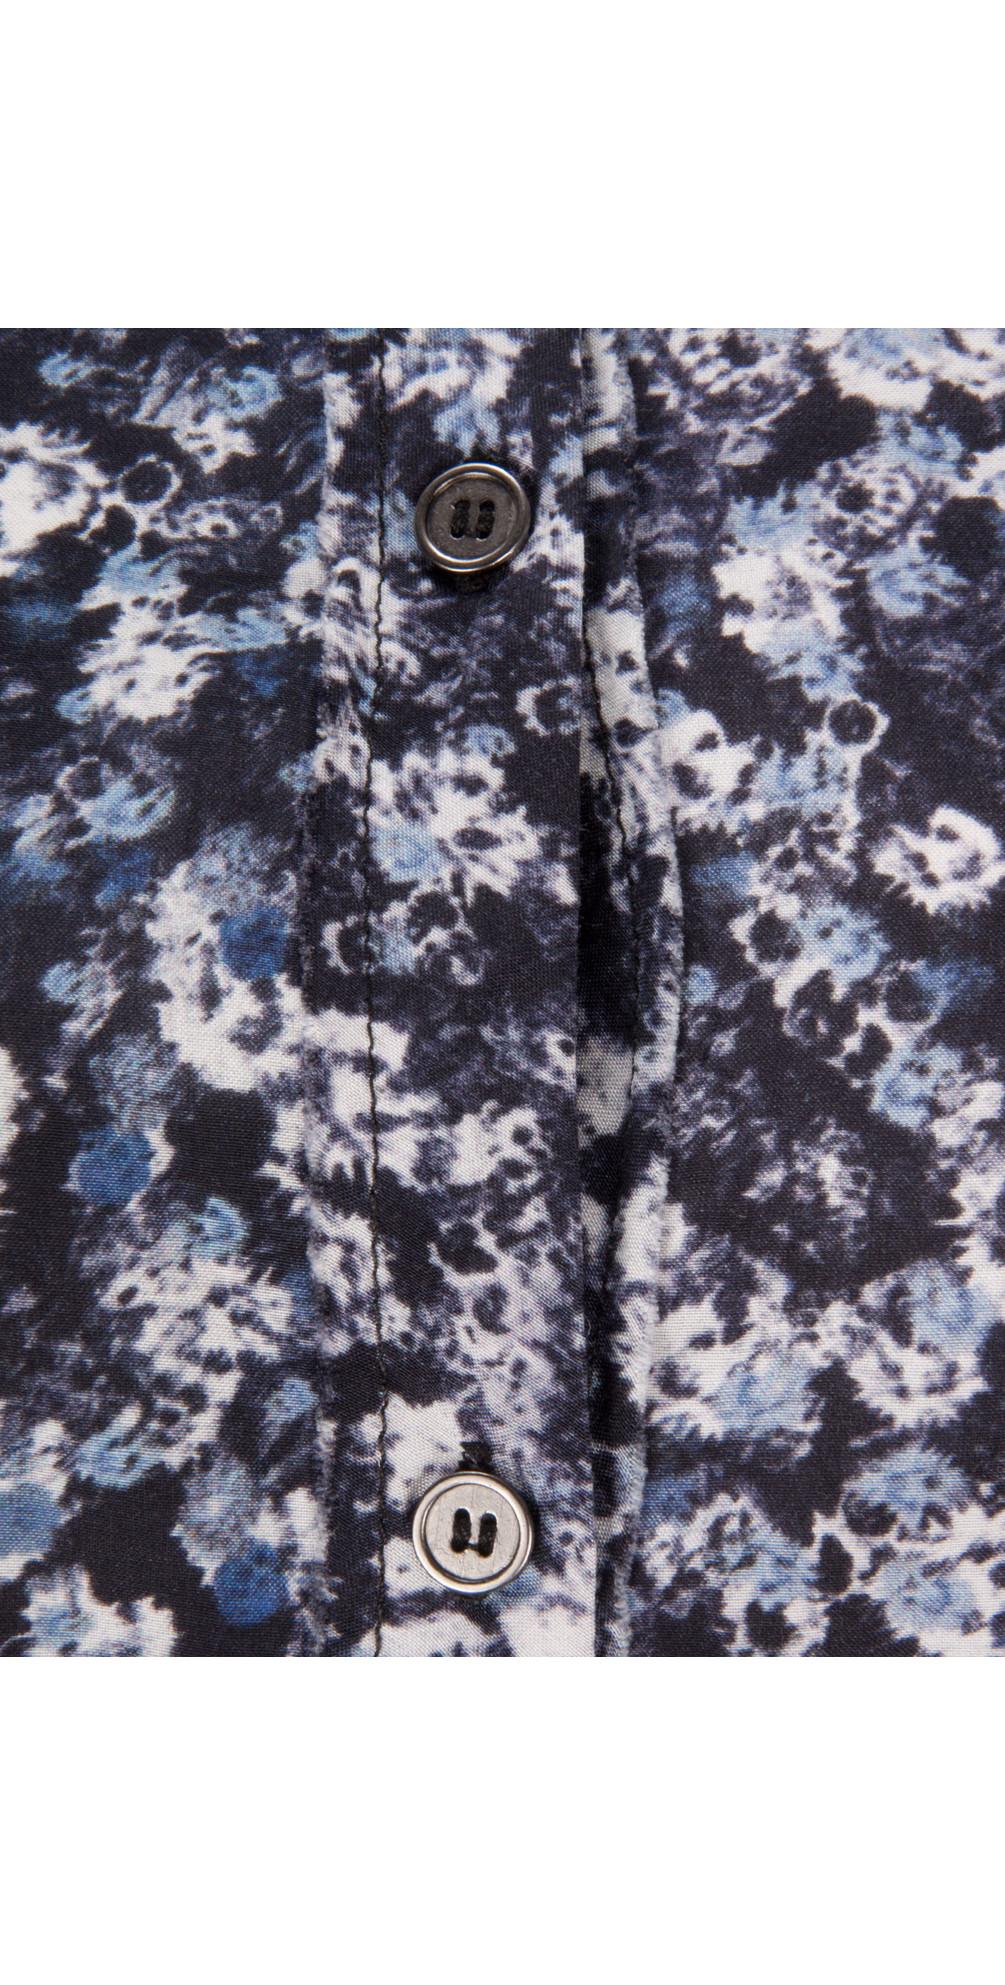 Leona Shirt main image